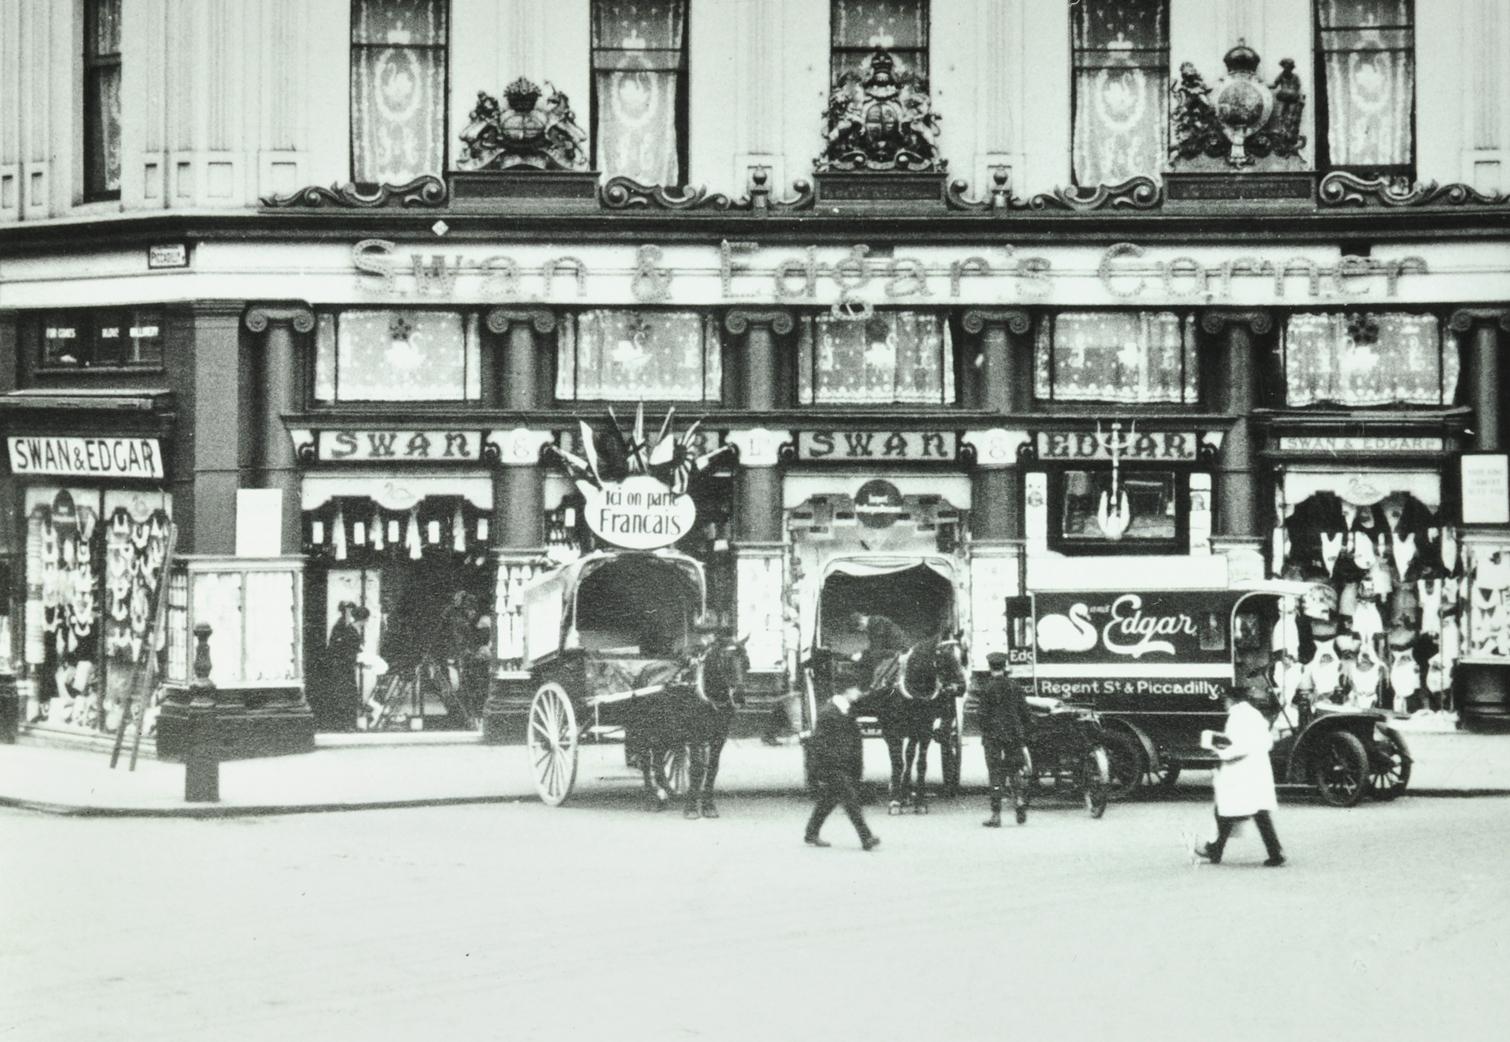 Swan and Edgar, Picaddilly Circus, 1920